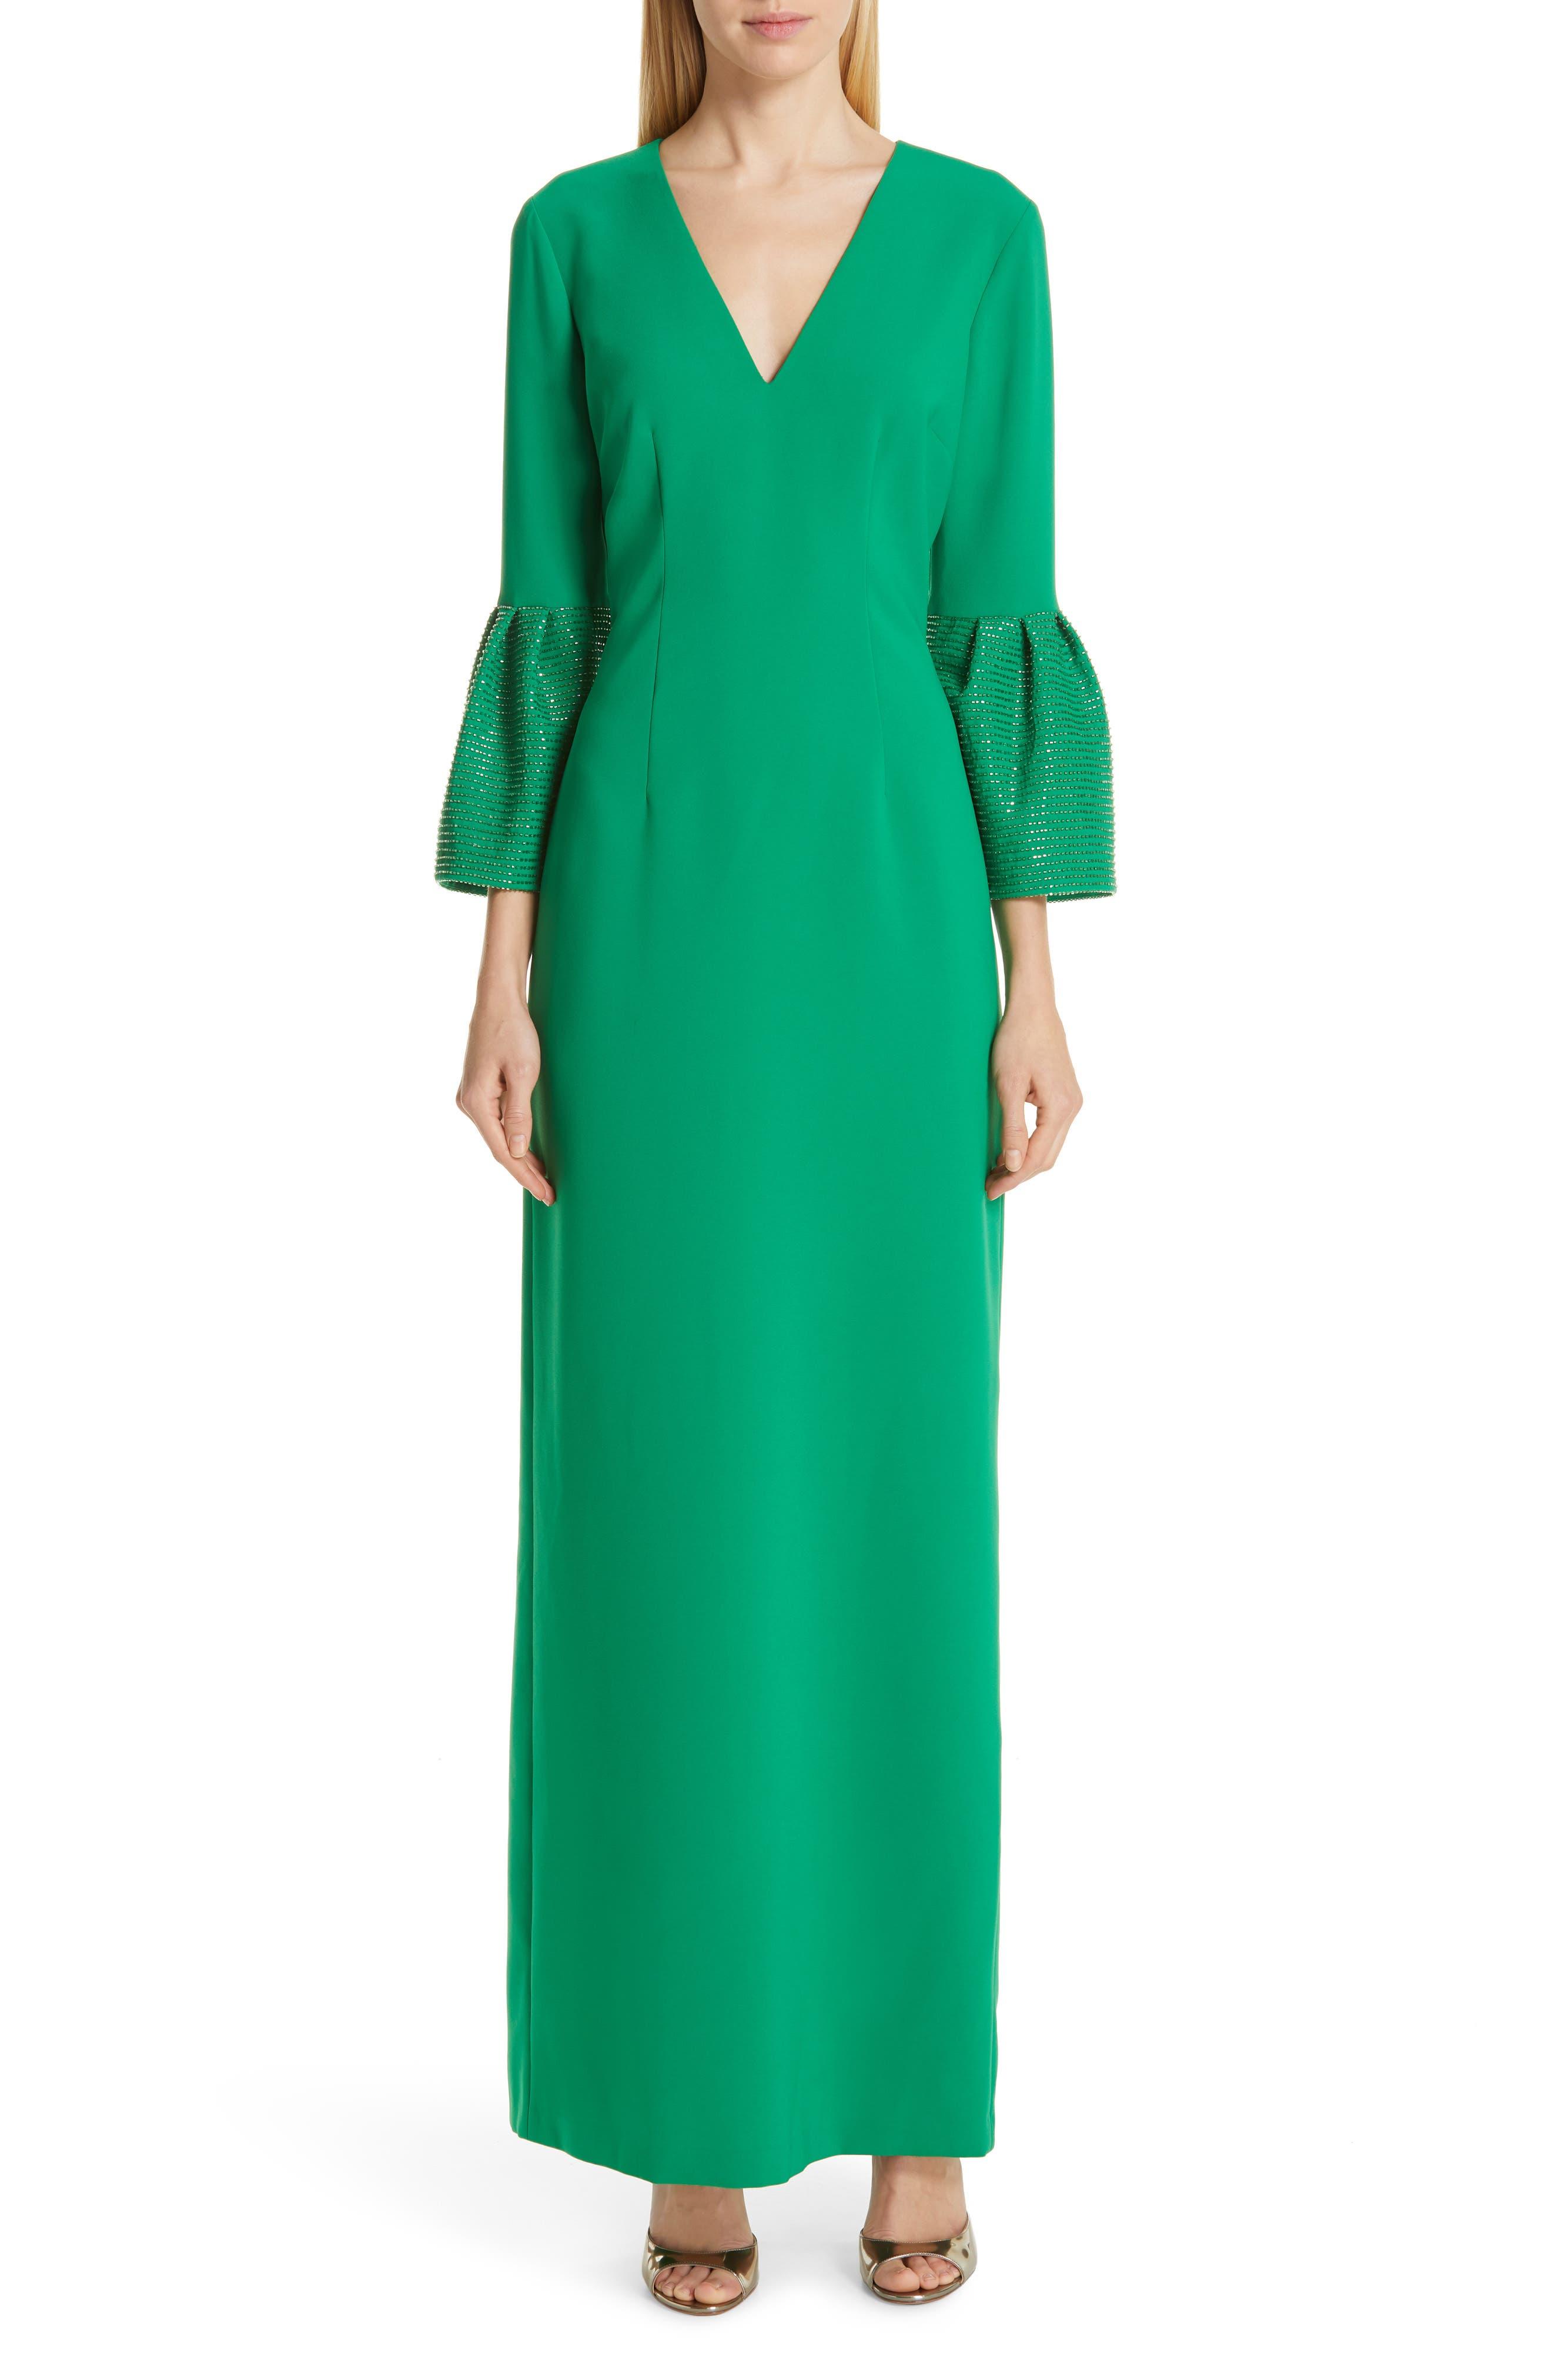 SACHIN & BABI, Tower Beaded Cuff Column Evening Dress, Main thumbnail 1, color, TOWER GREEN